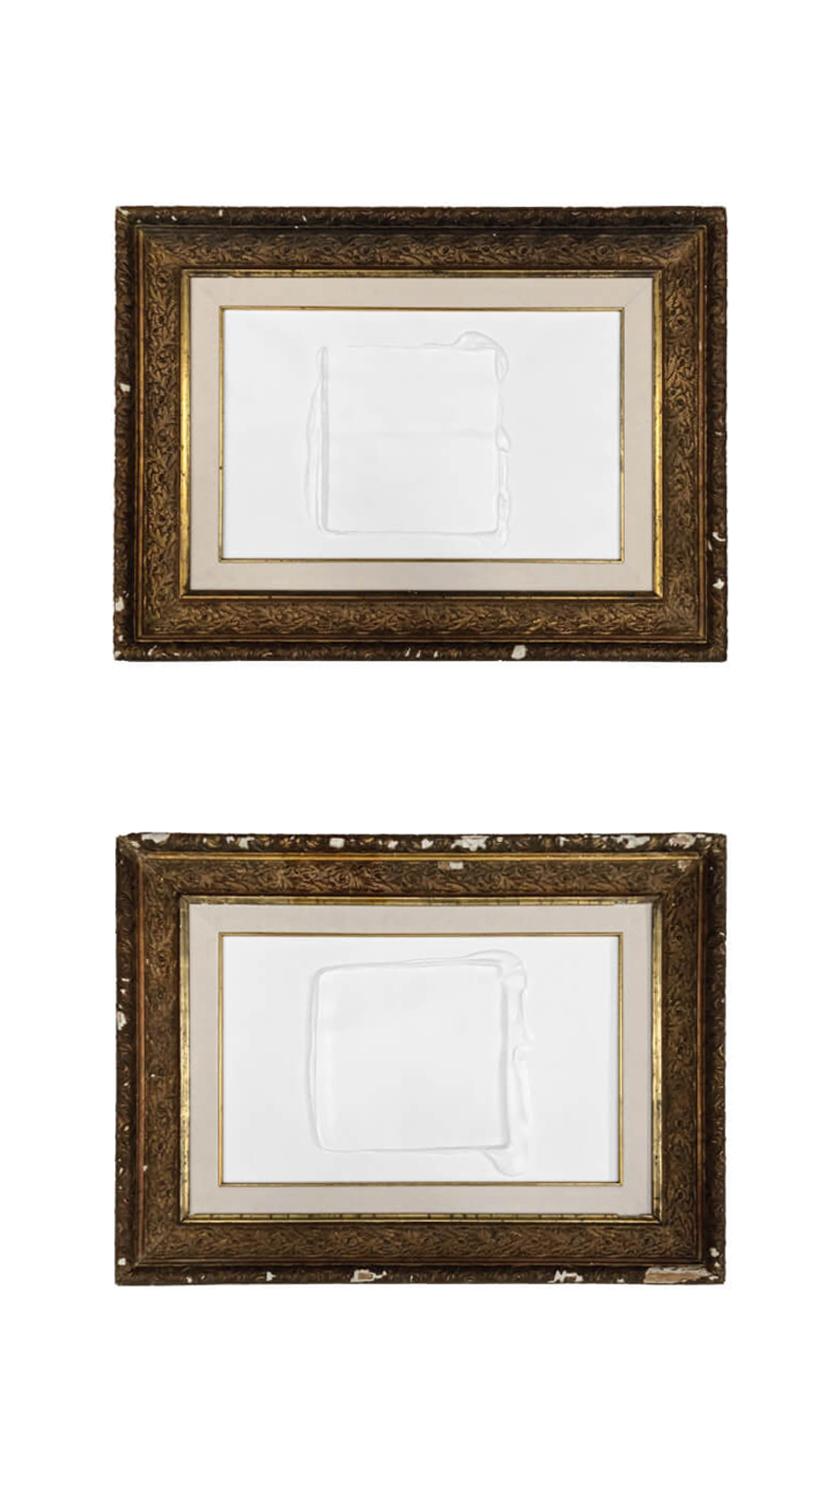 02-ELTIEMPO-AARON-NACHTAILER-ART-ARTIST-MARBLE-VERTICAL